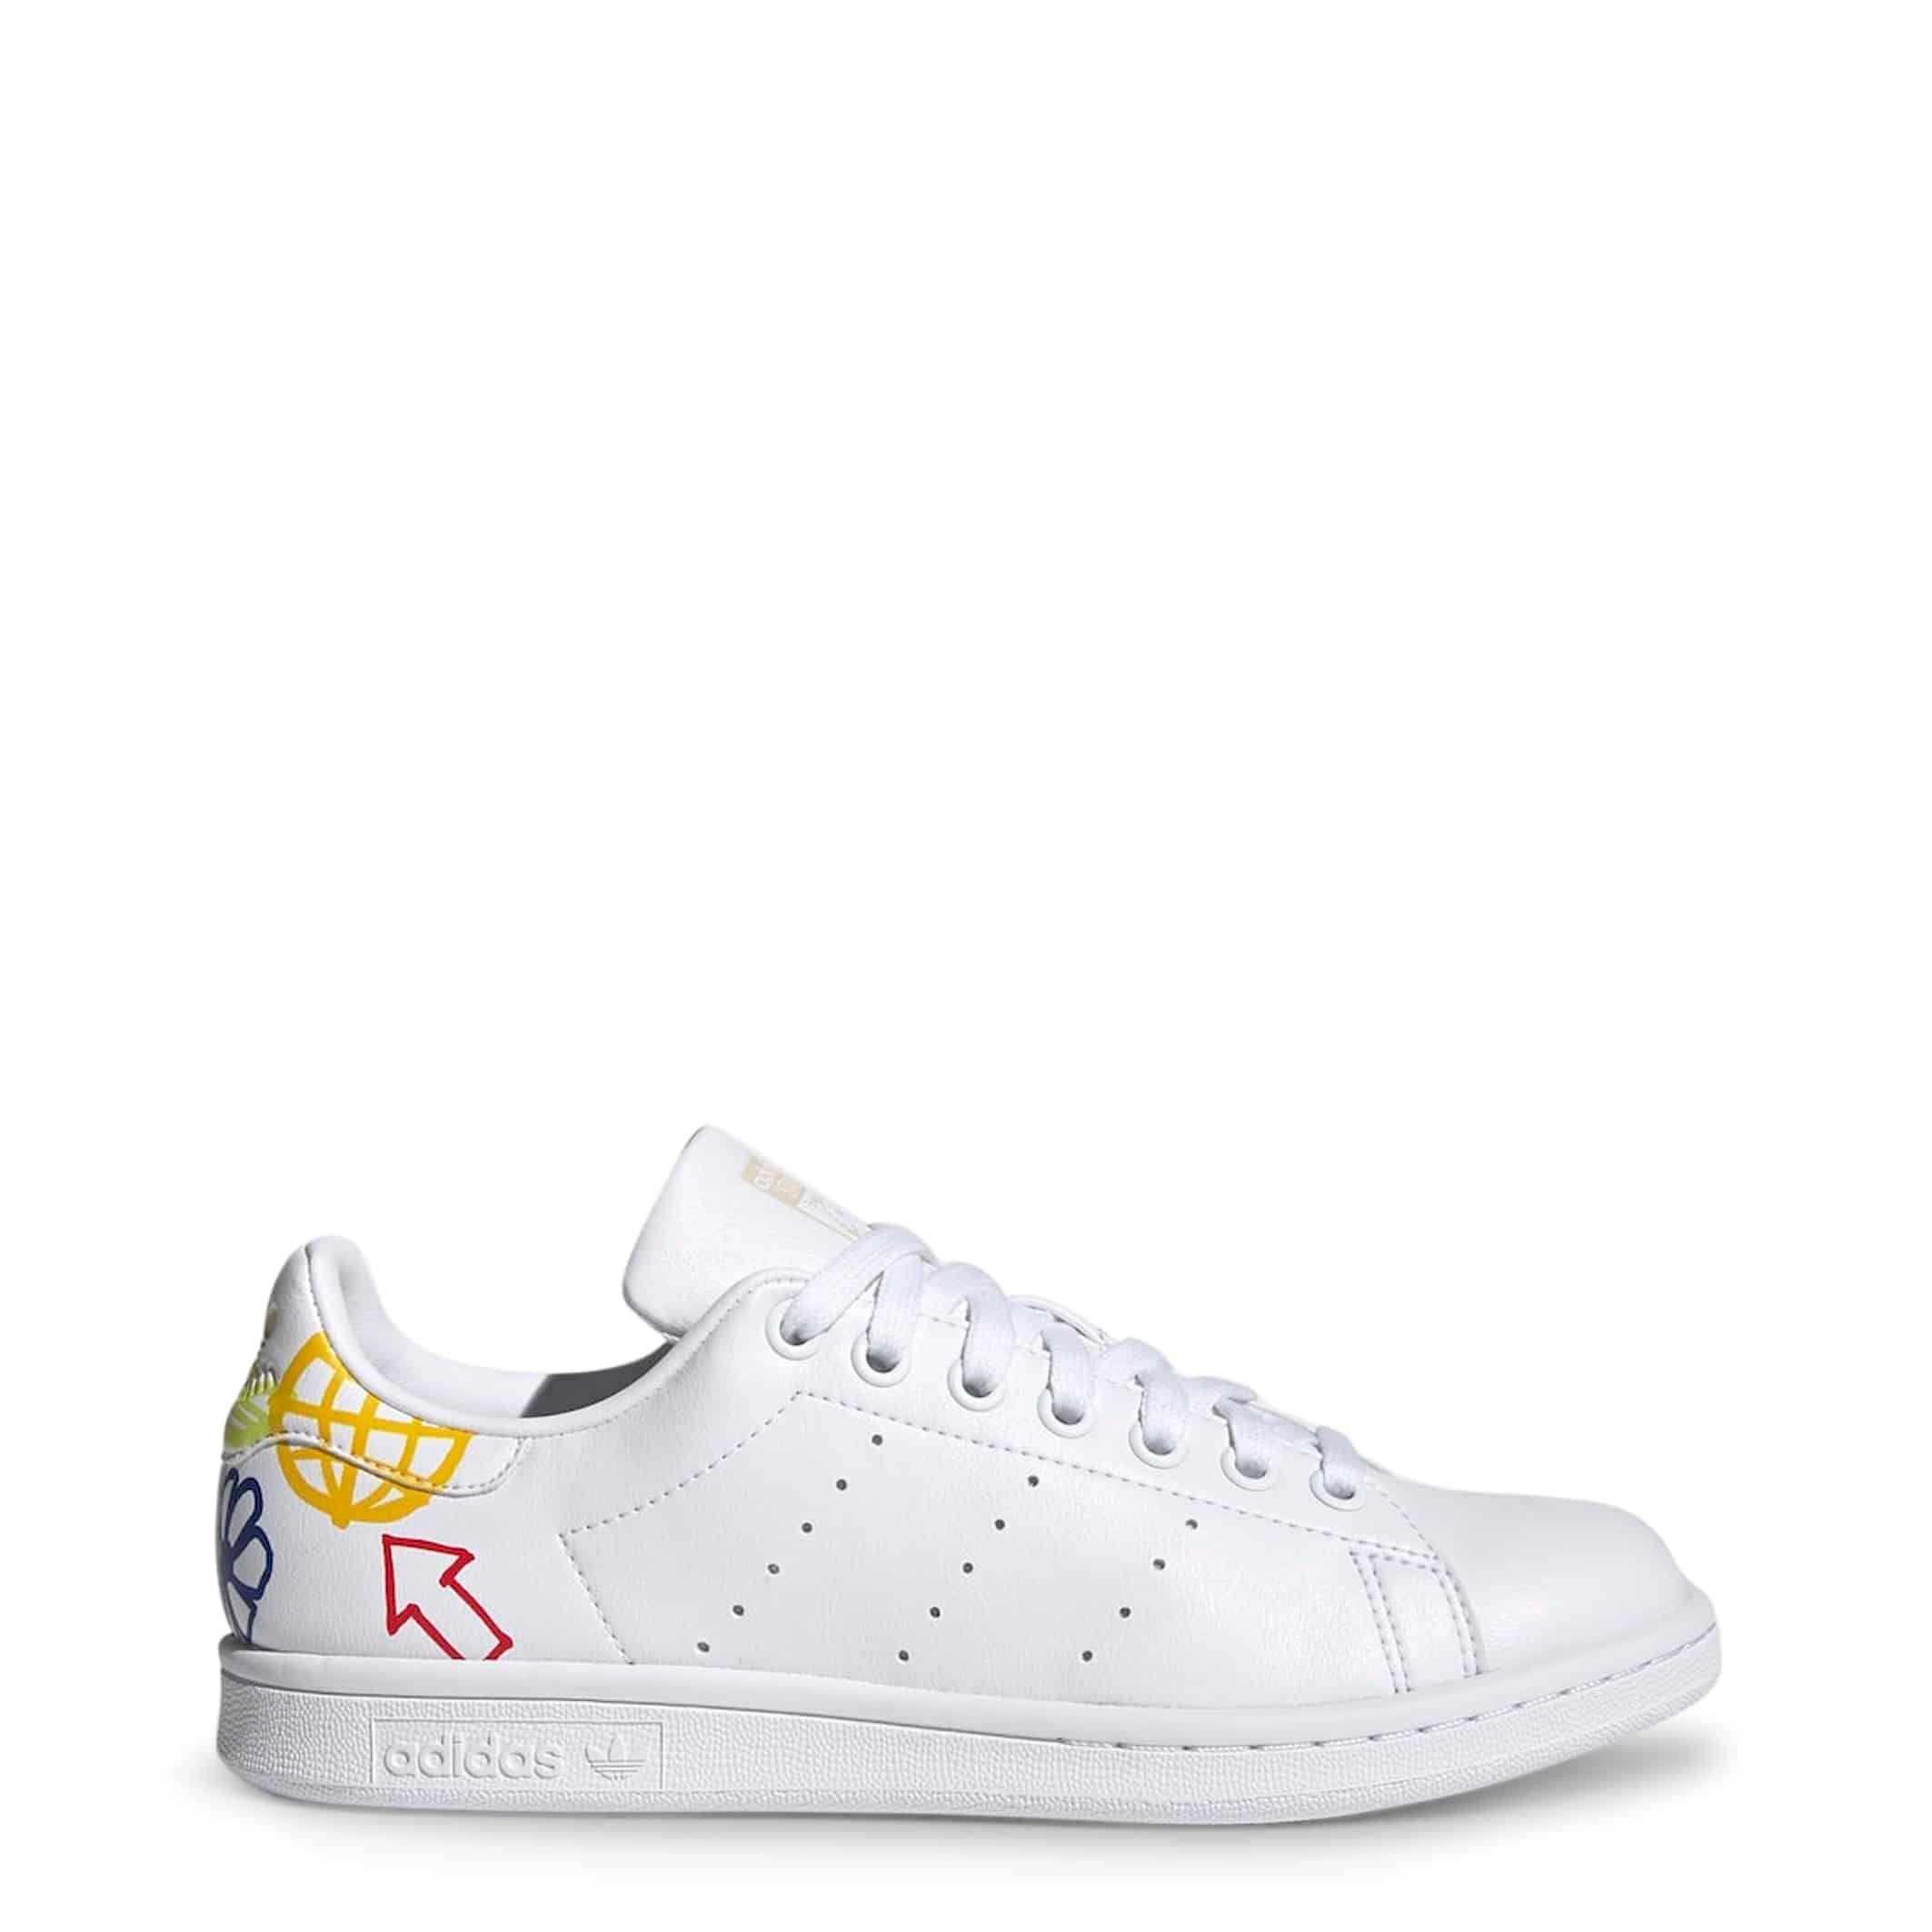 Adidas – StanSmith – Wit Designeritems.nl